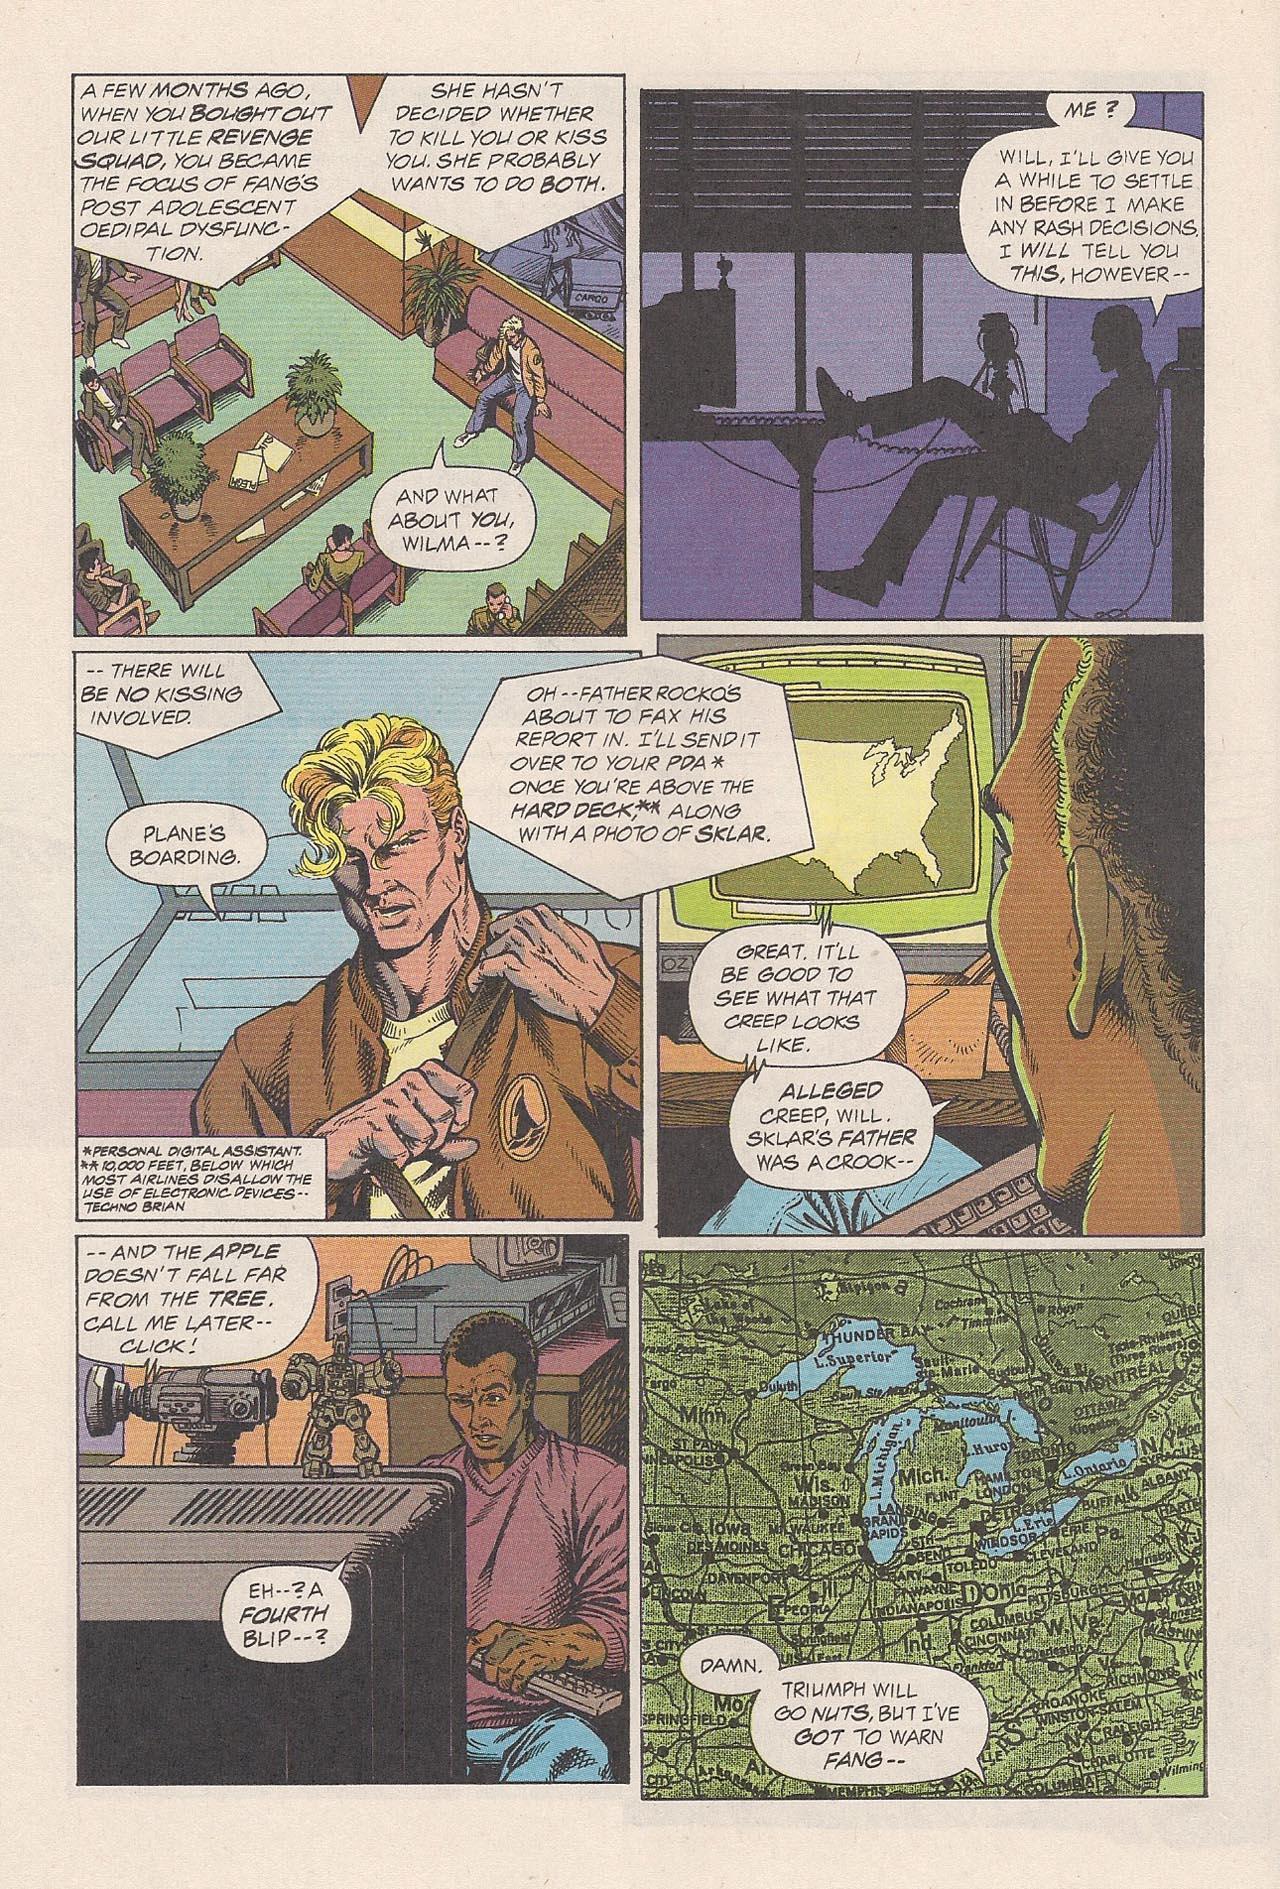 Read online Triumph comic -  Issue #2 - 20